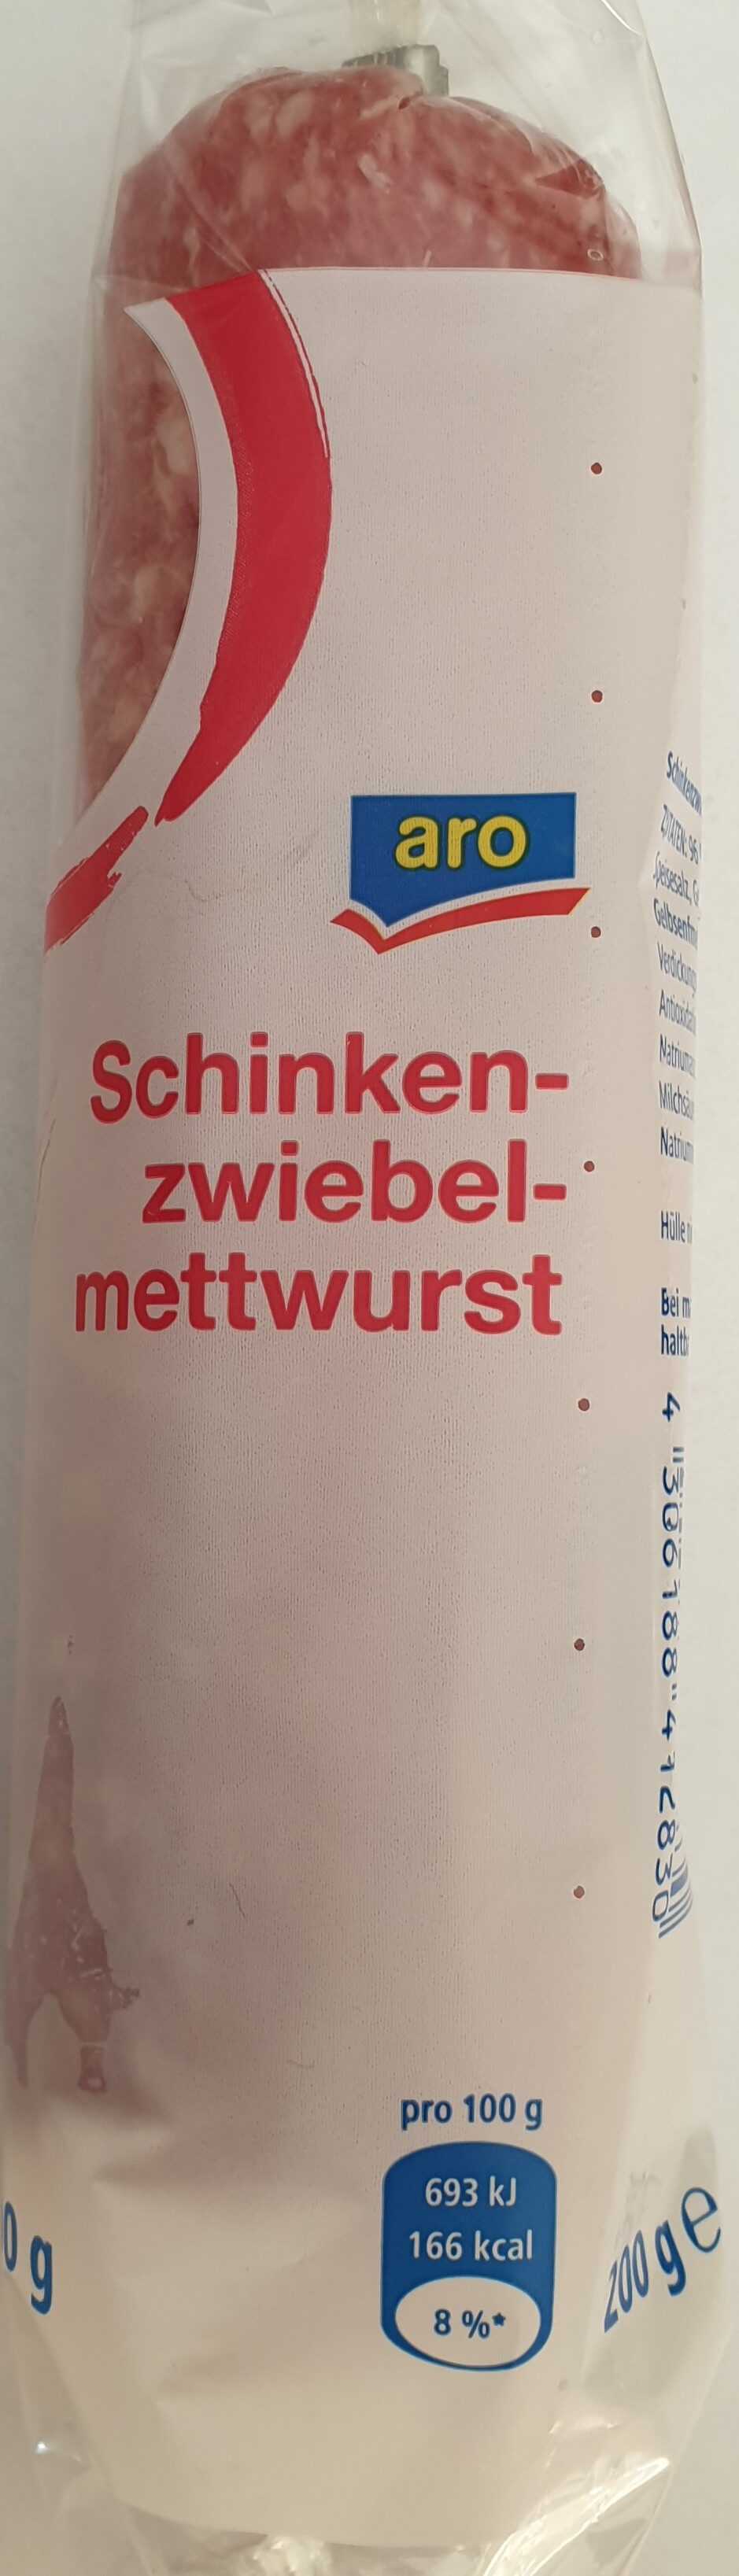 Schinkenzwiebelmettwurst - Produit - de